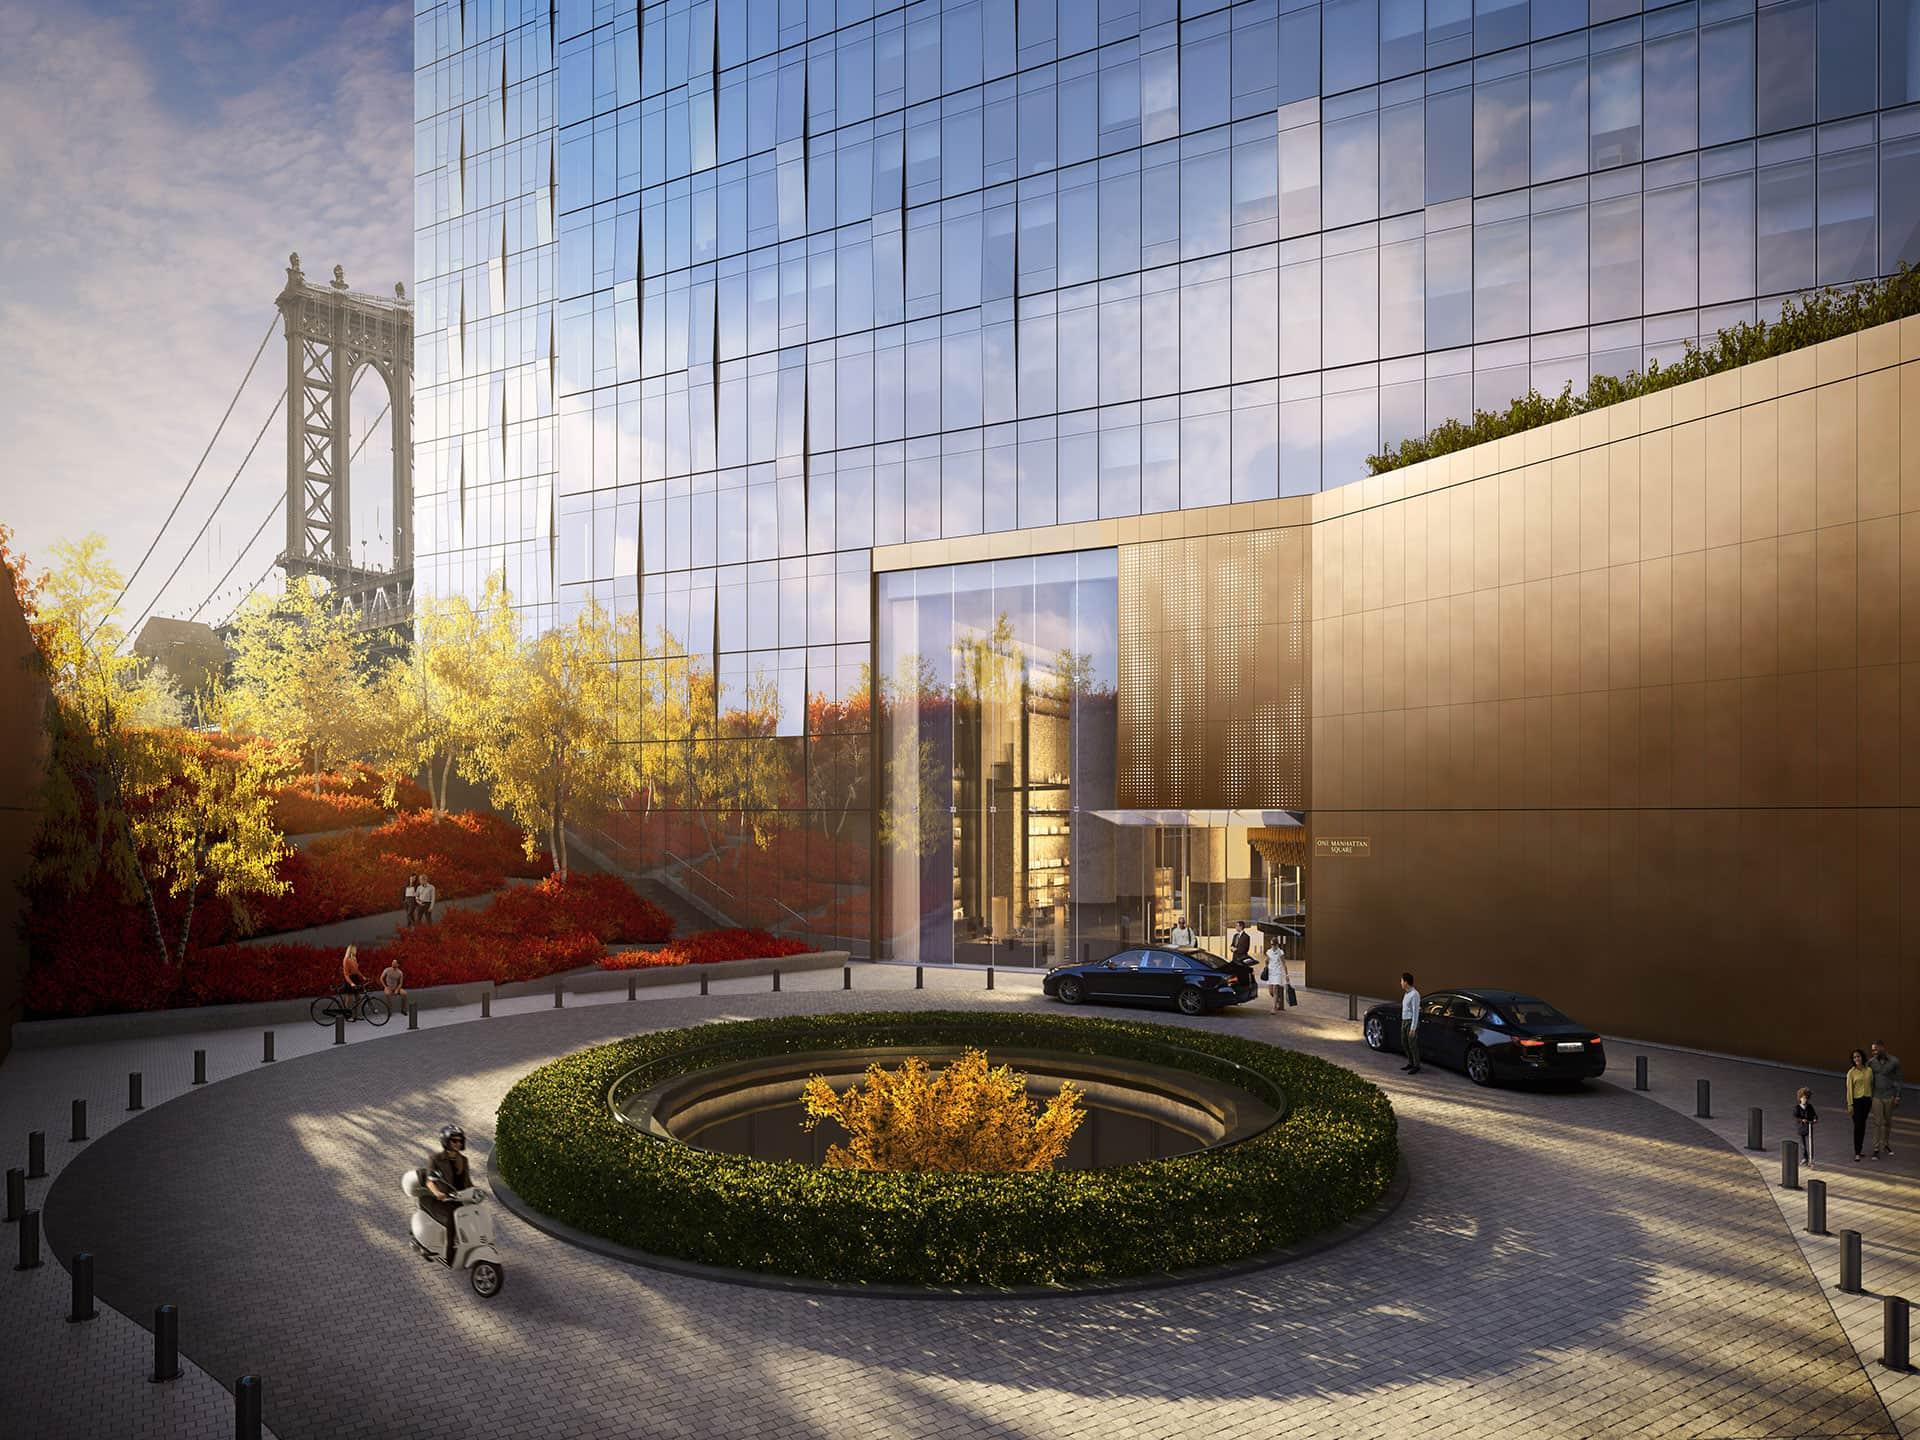 Manhattan Luxury Condos: Amenities